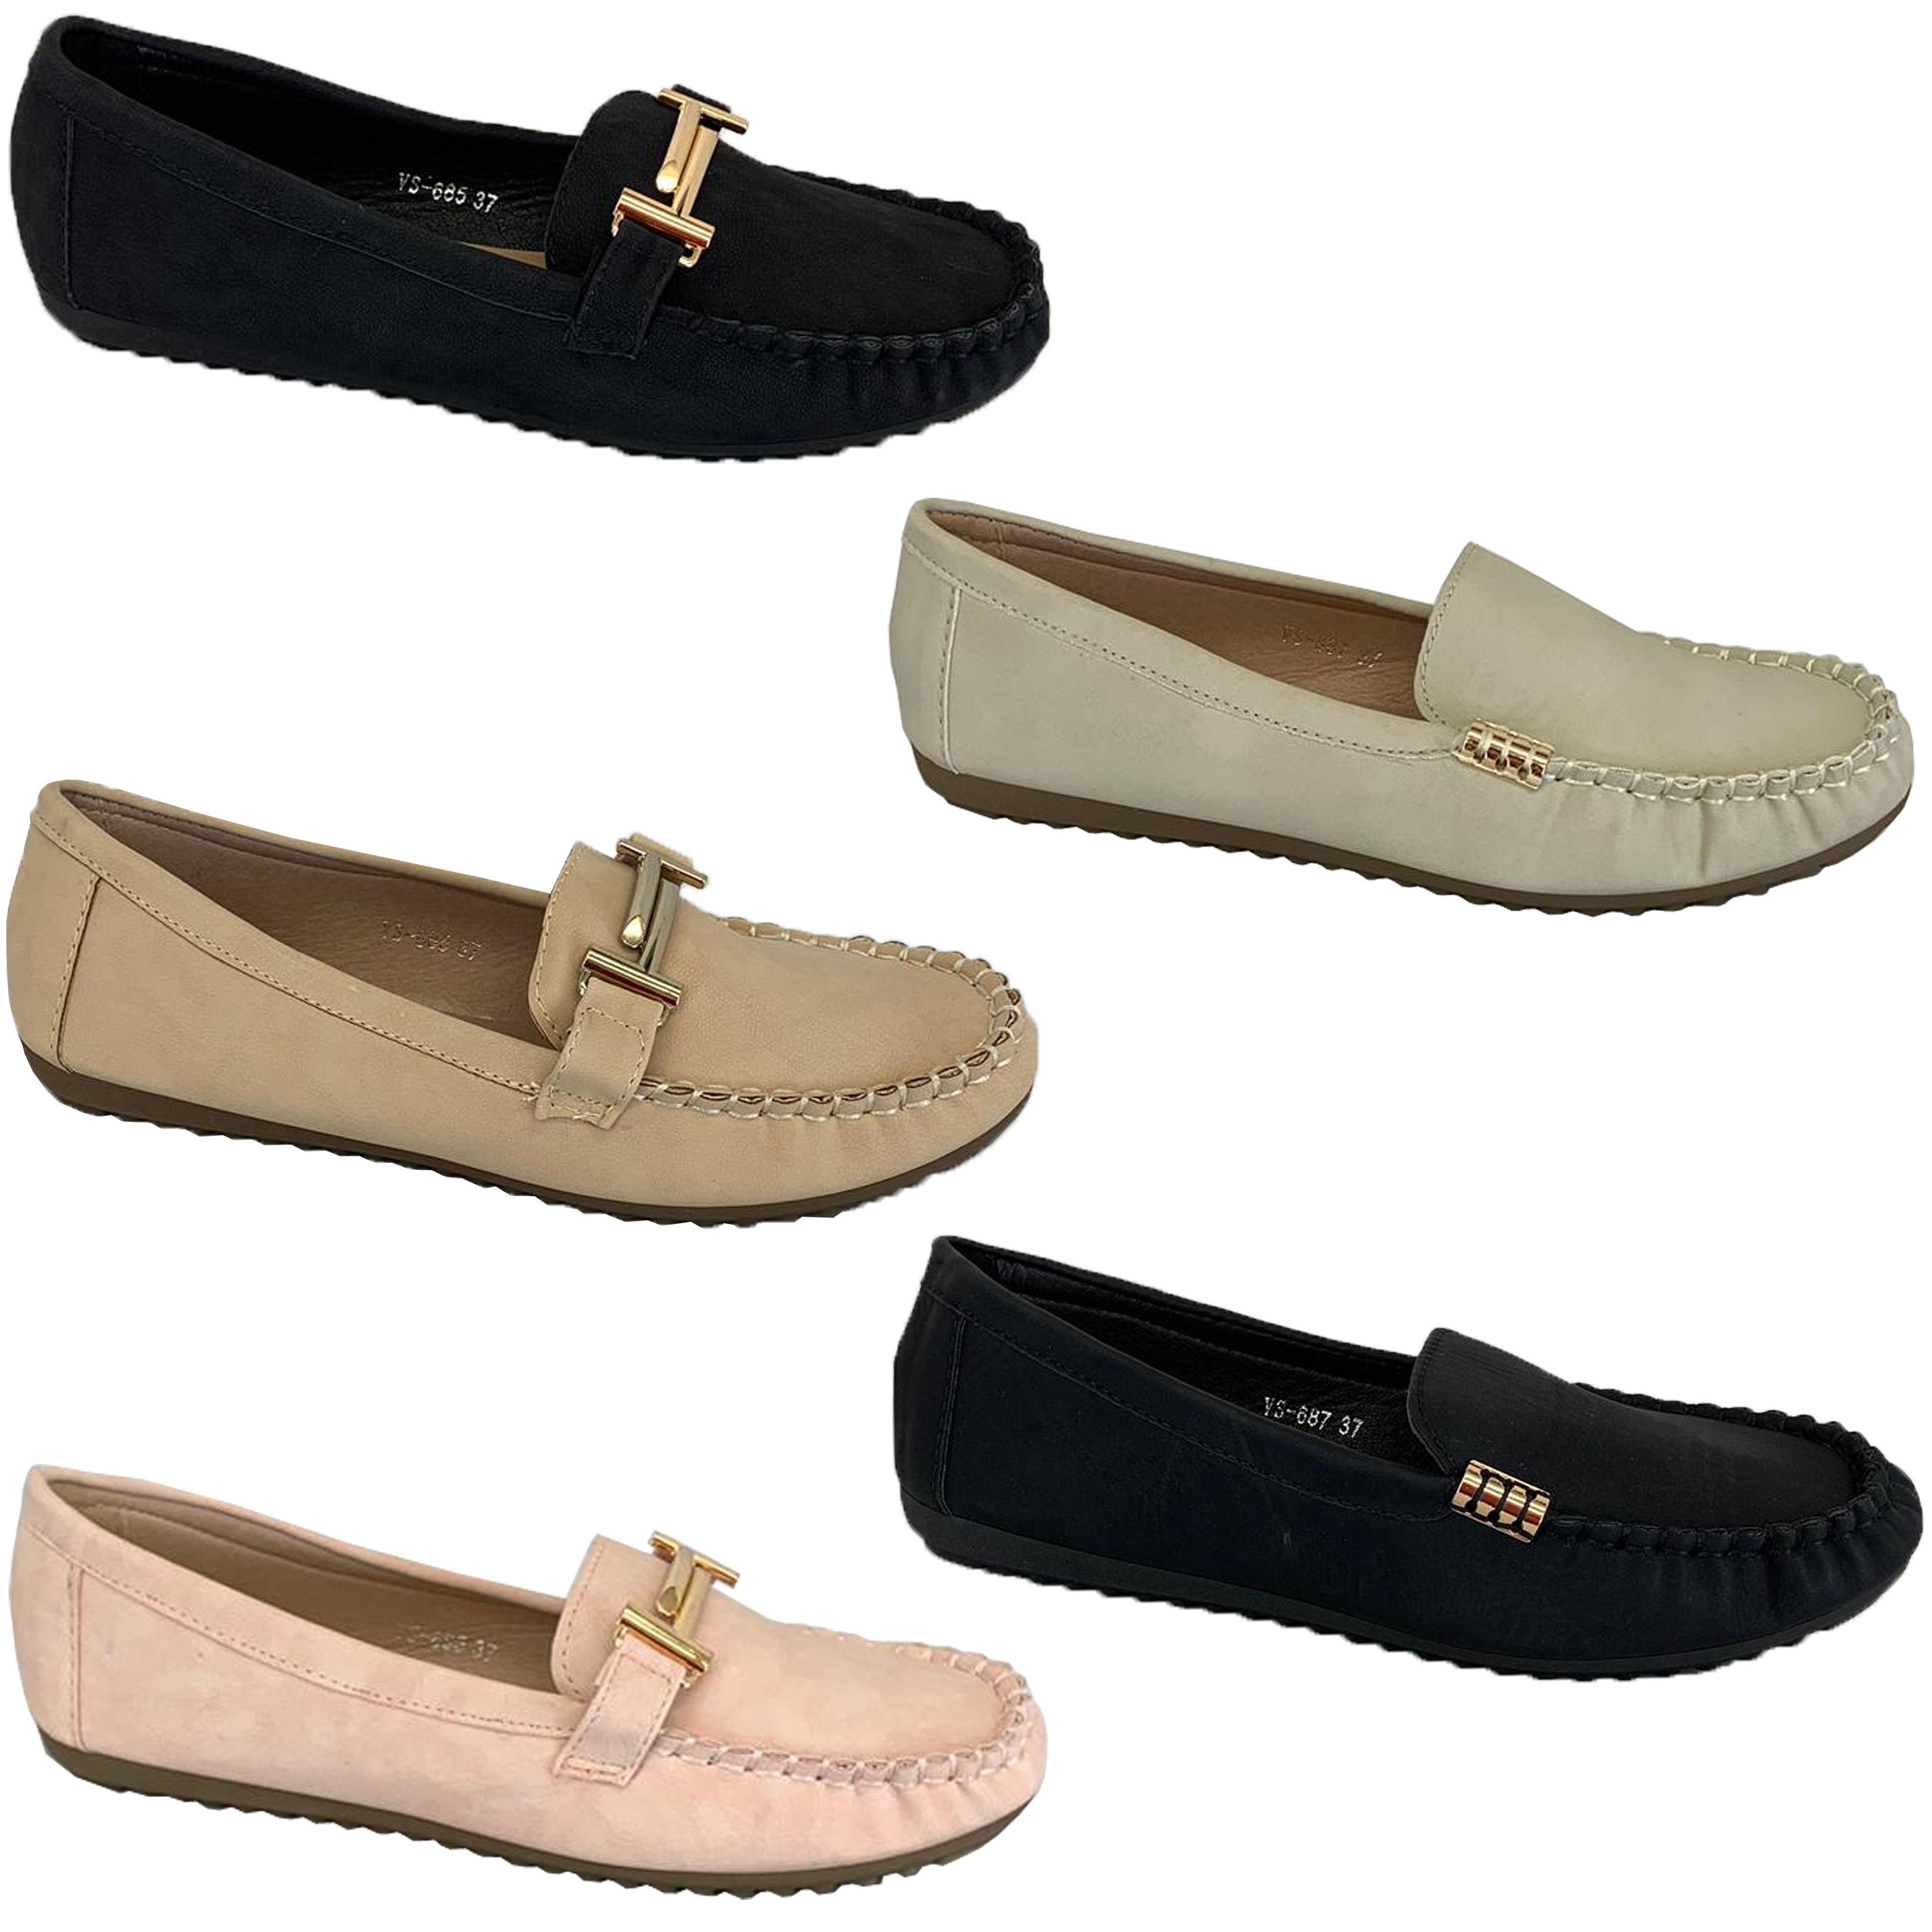 Ladies Moccasins Slip On Shoes